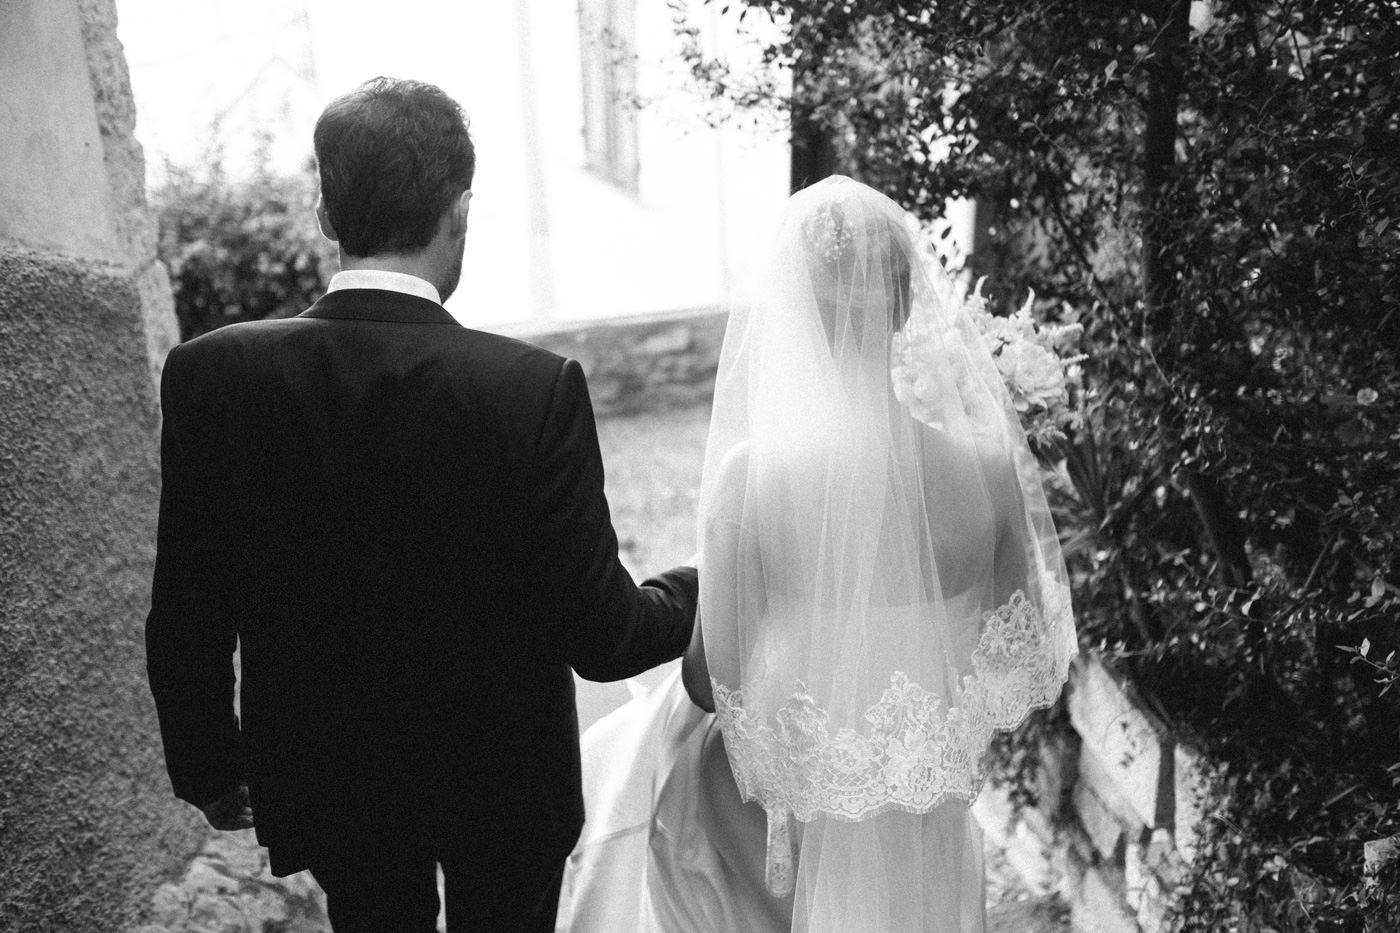 matrimoni_all_italiana_fotografo_matrimonio_cinque_terre-47.jpg